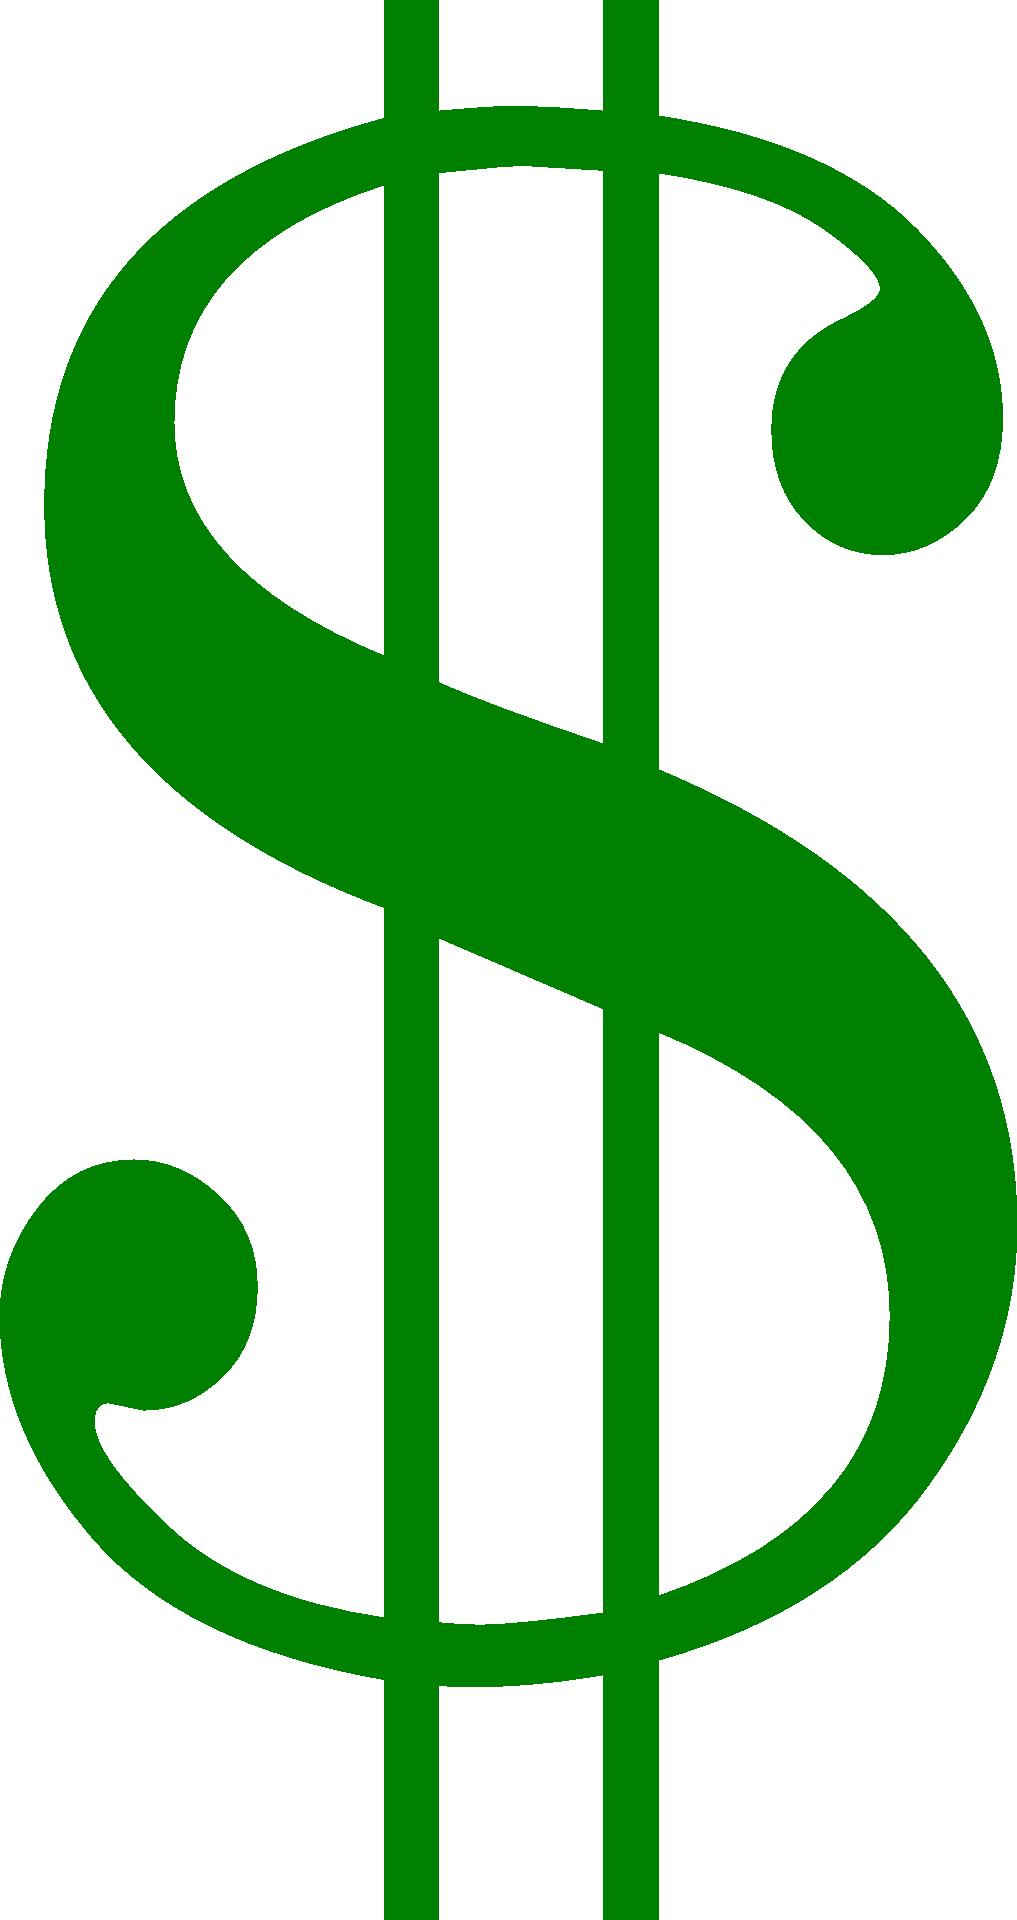 Money outline clipart clipart transparent stock Scathing New Report Reveals Texas Nursing Homes Lack Enforcement and ... clipart transparent stock